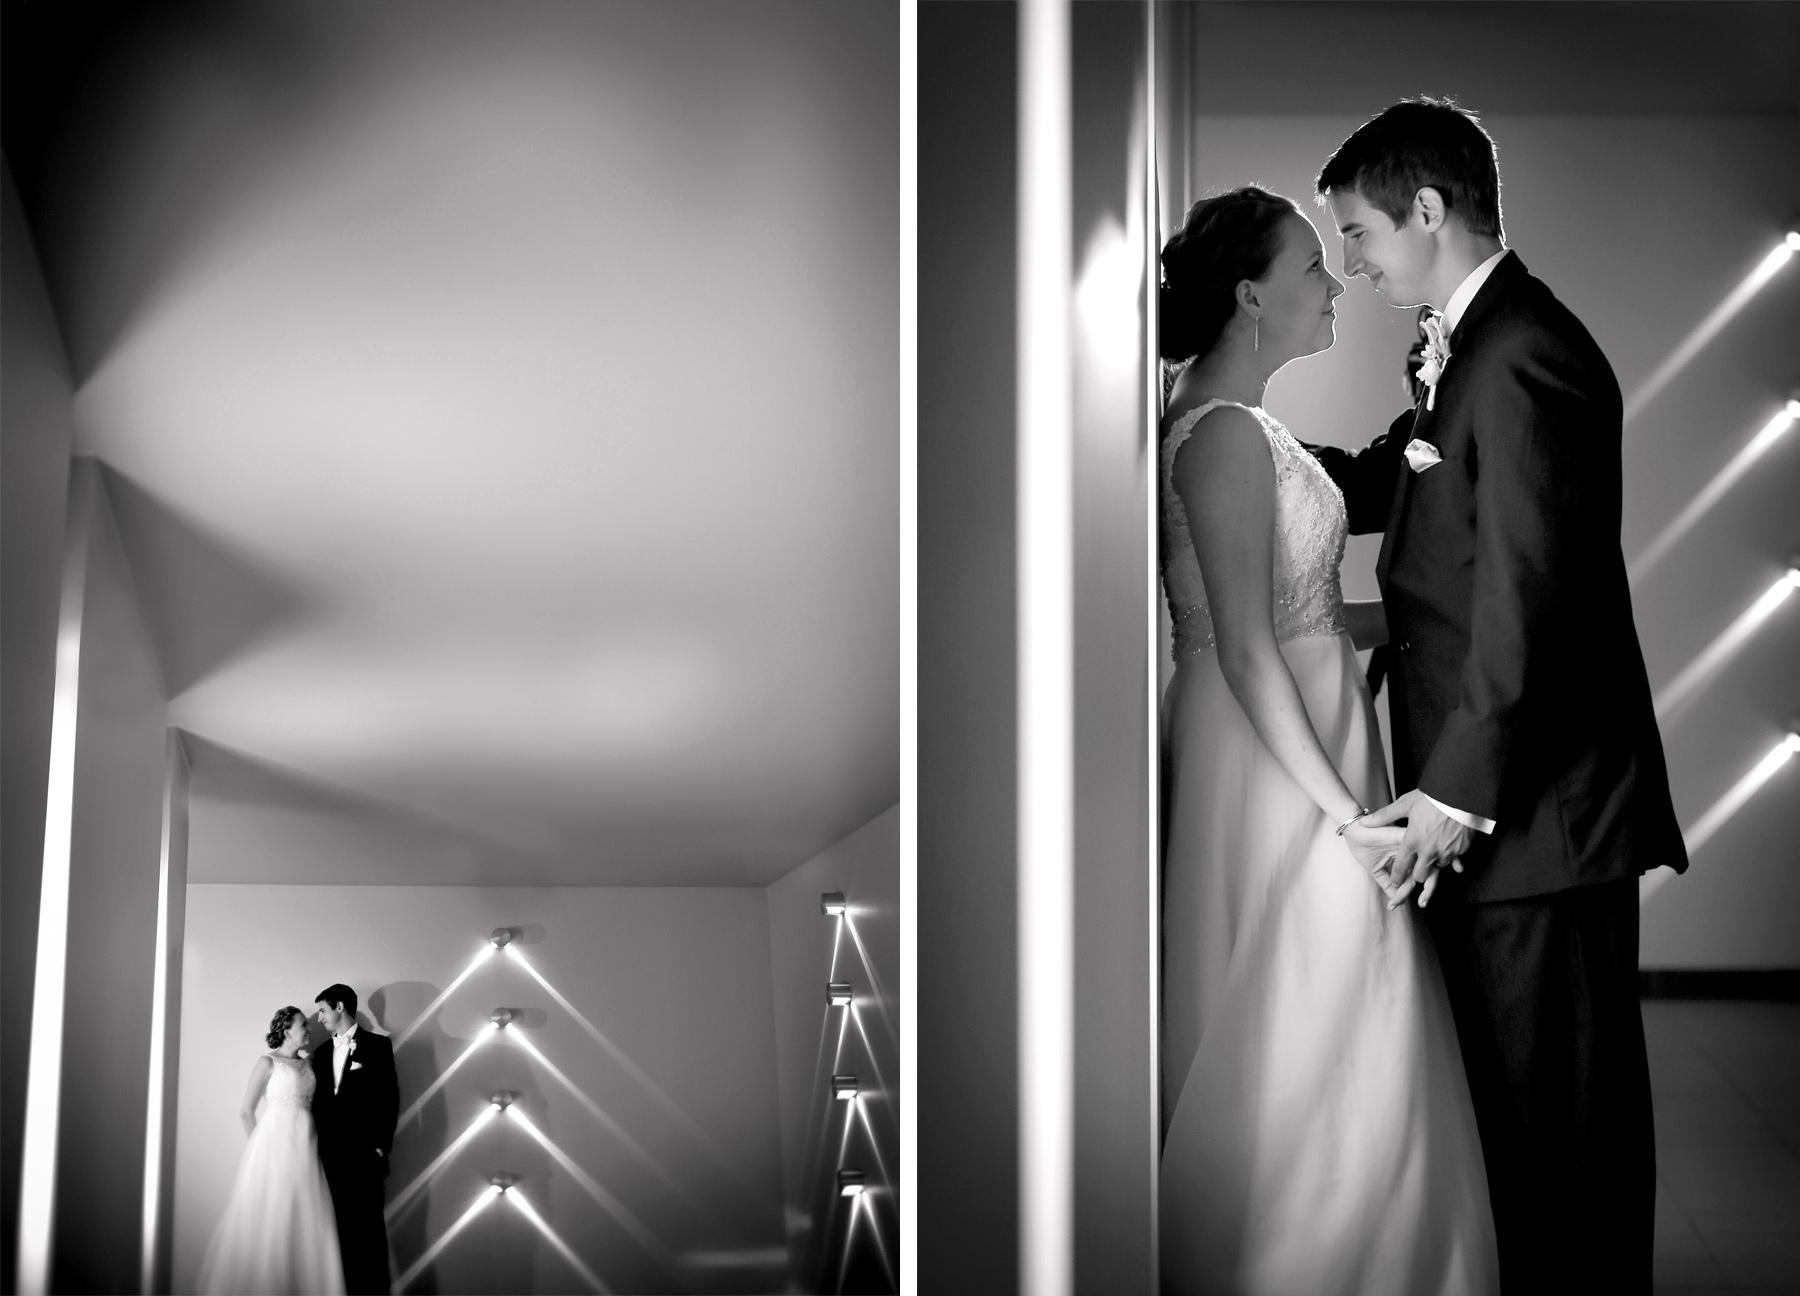 14-Minneapolis-Minnesota-Wedding-Photography-by-Vick-Photography-Edina-Westin-Hotel-Grace-&-Nick.jpg